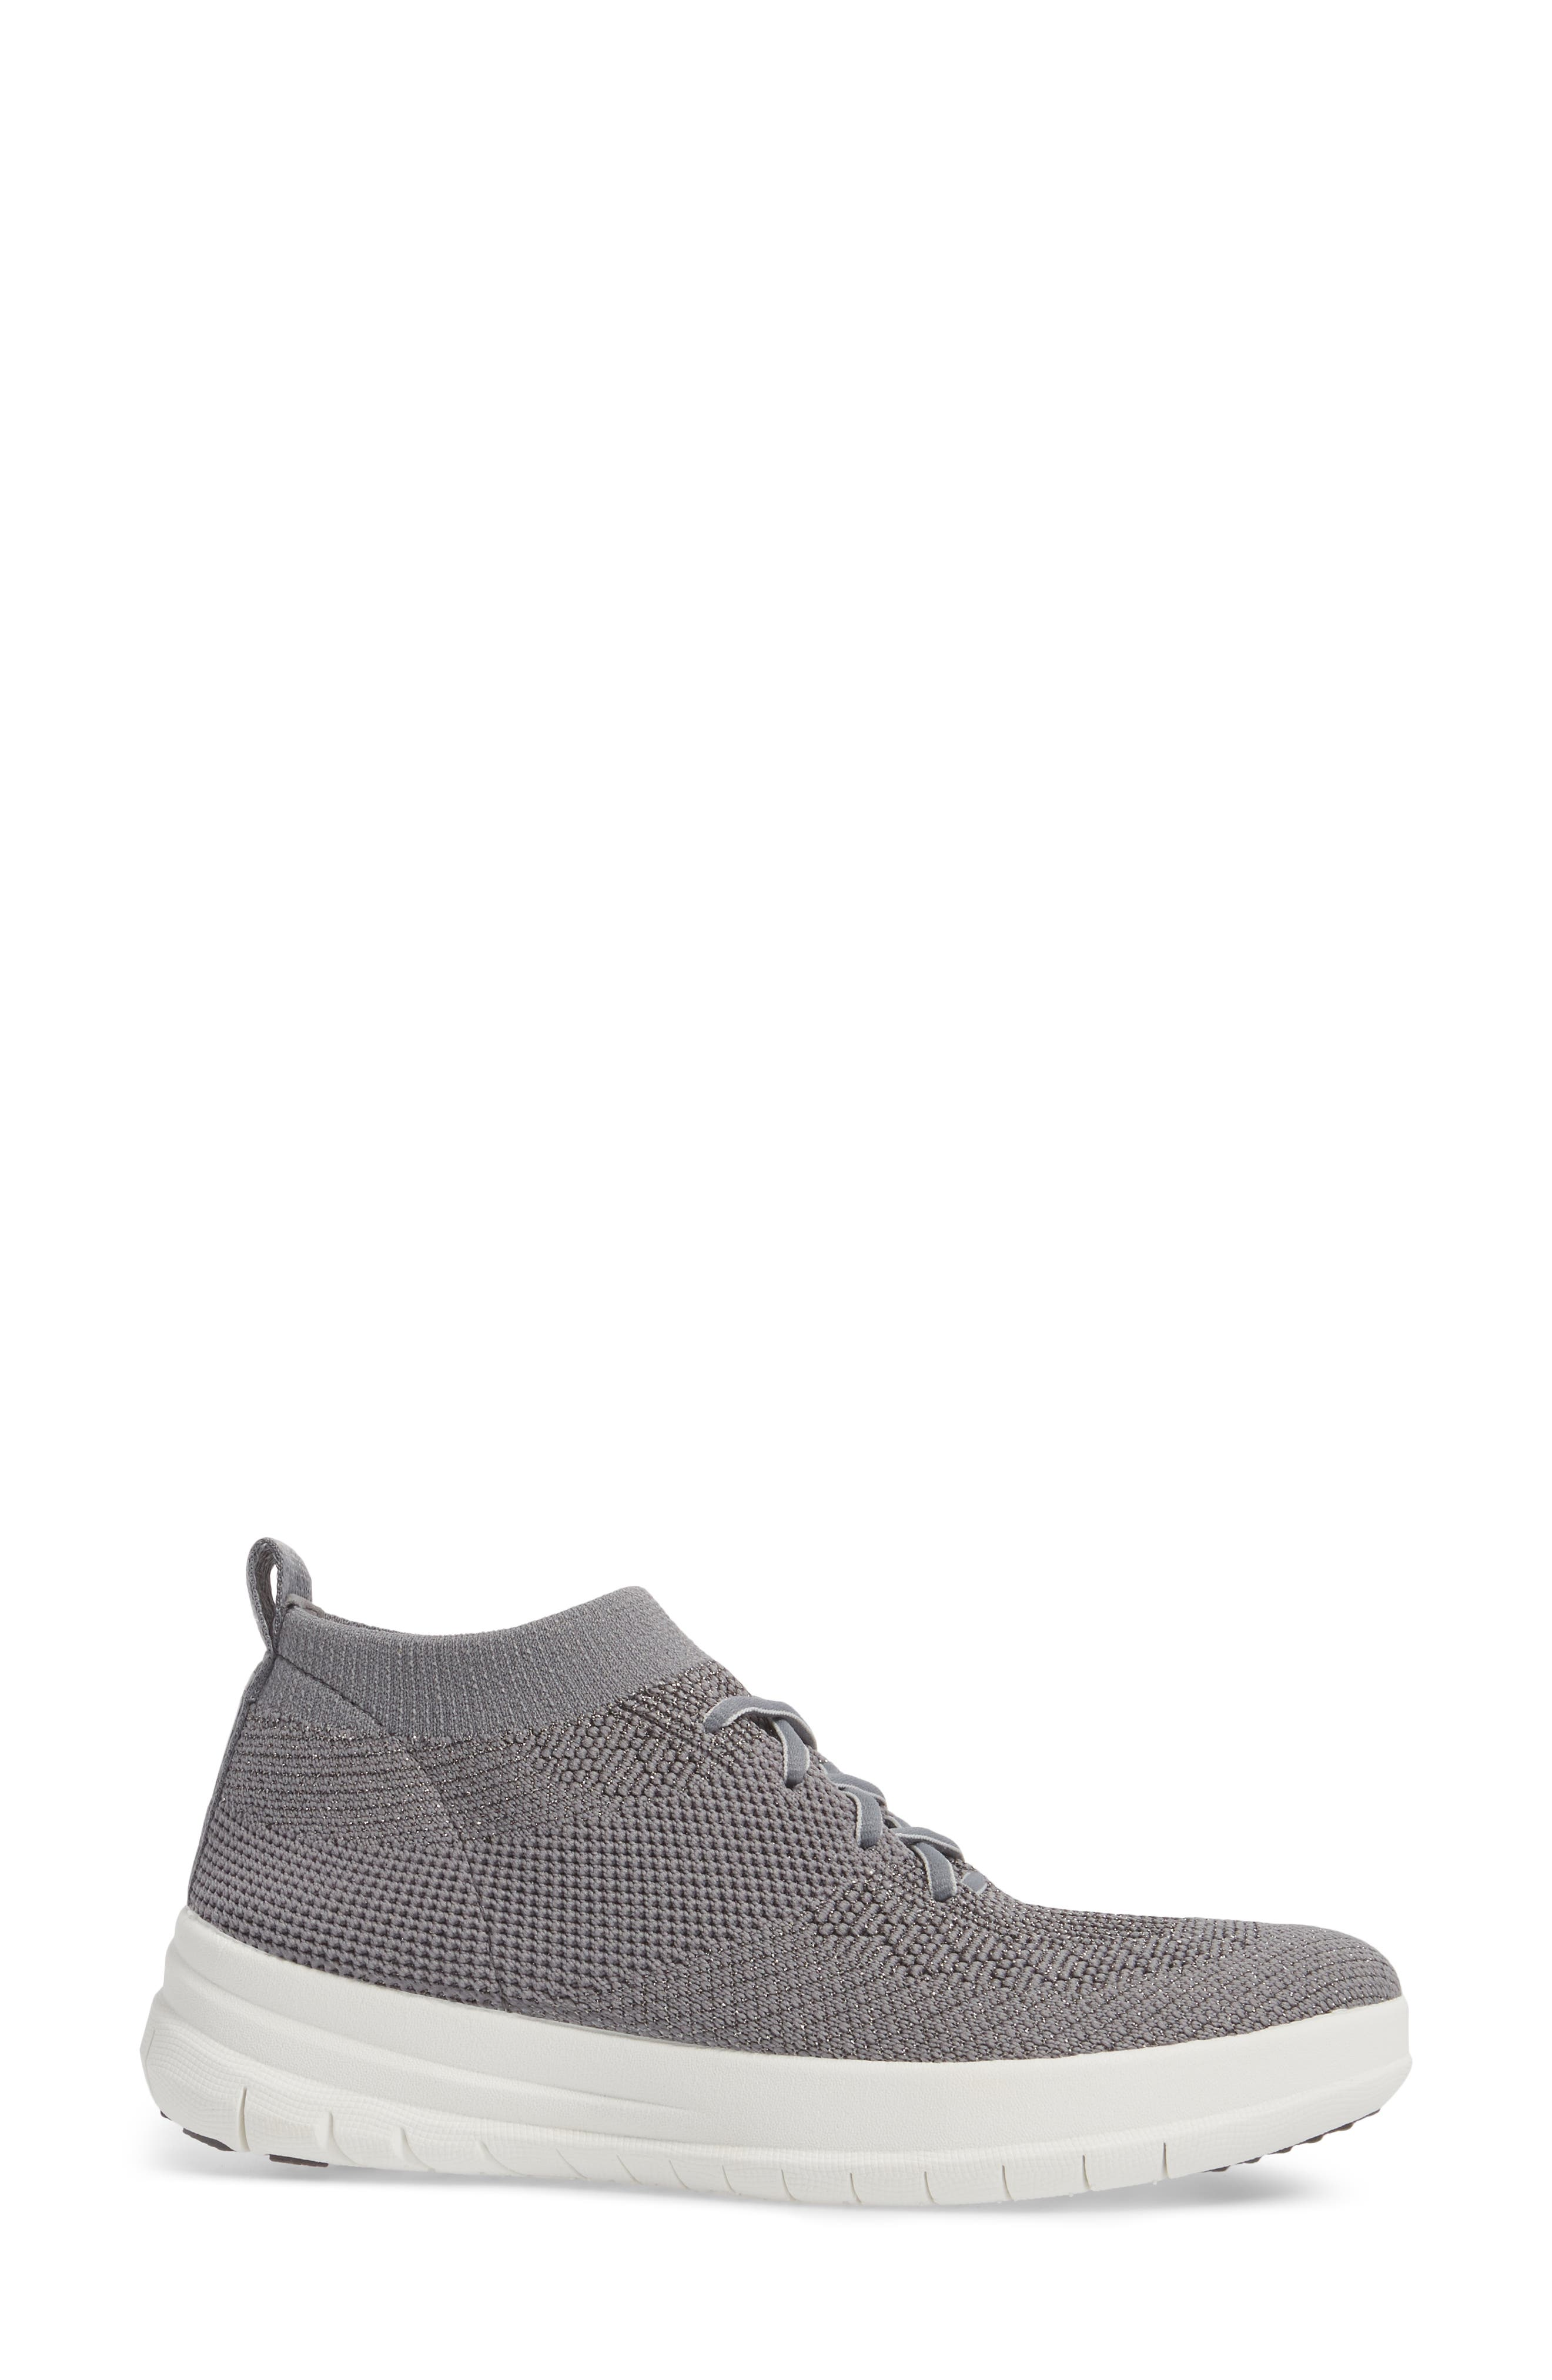 Alternate Image 3  - FitFlop Uberknit™ Slip-On High-Top Sneaker (Women)